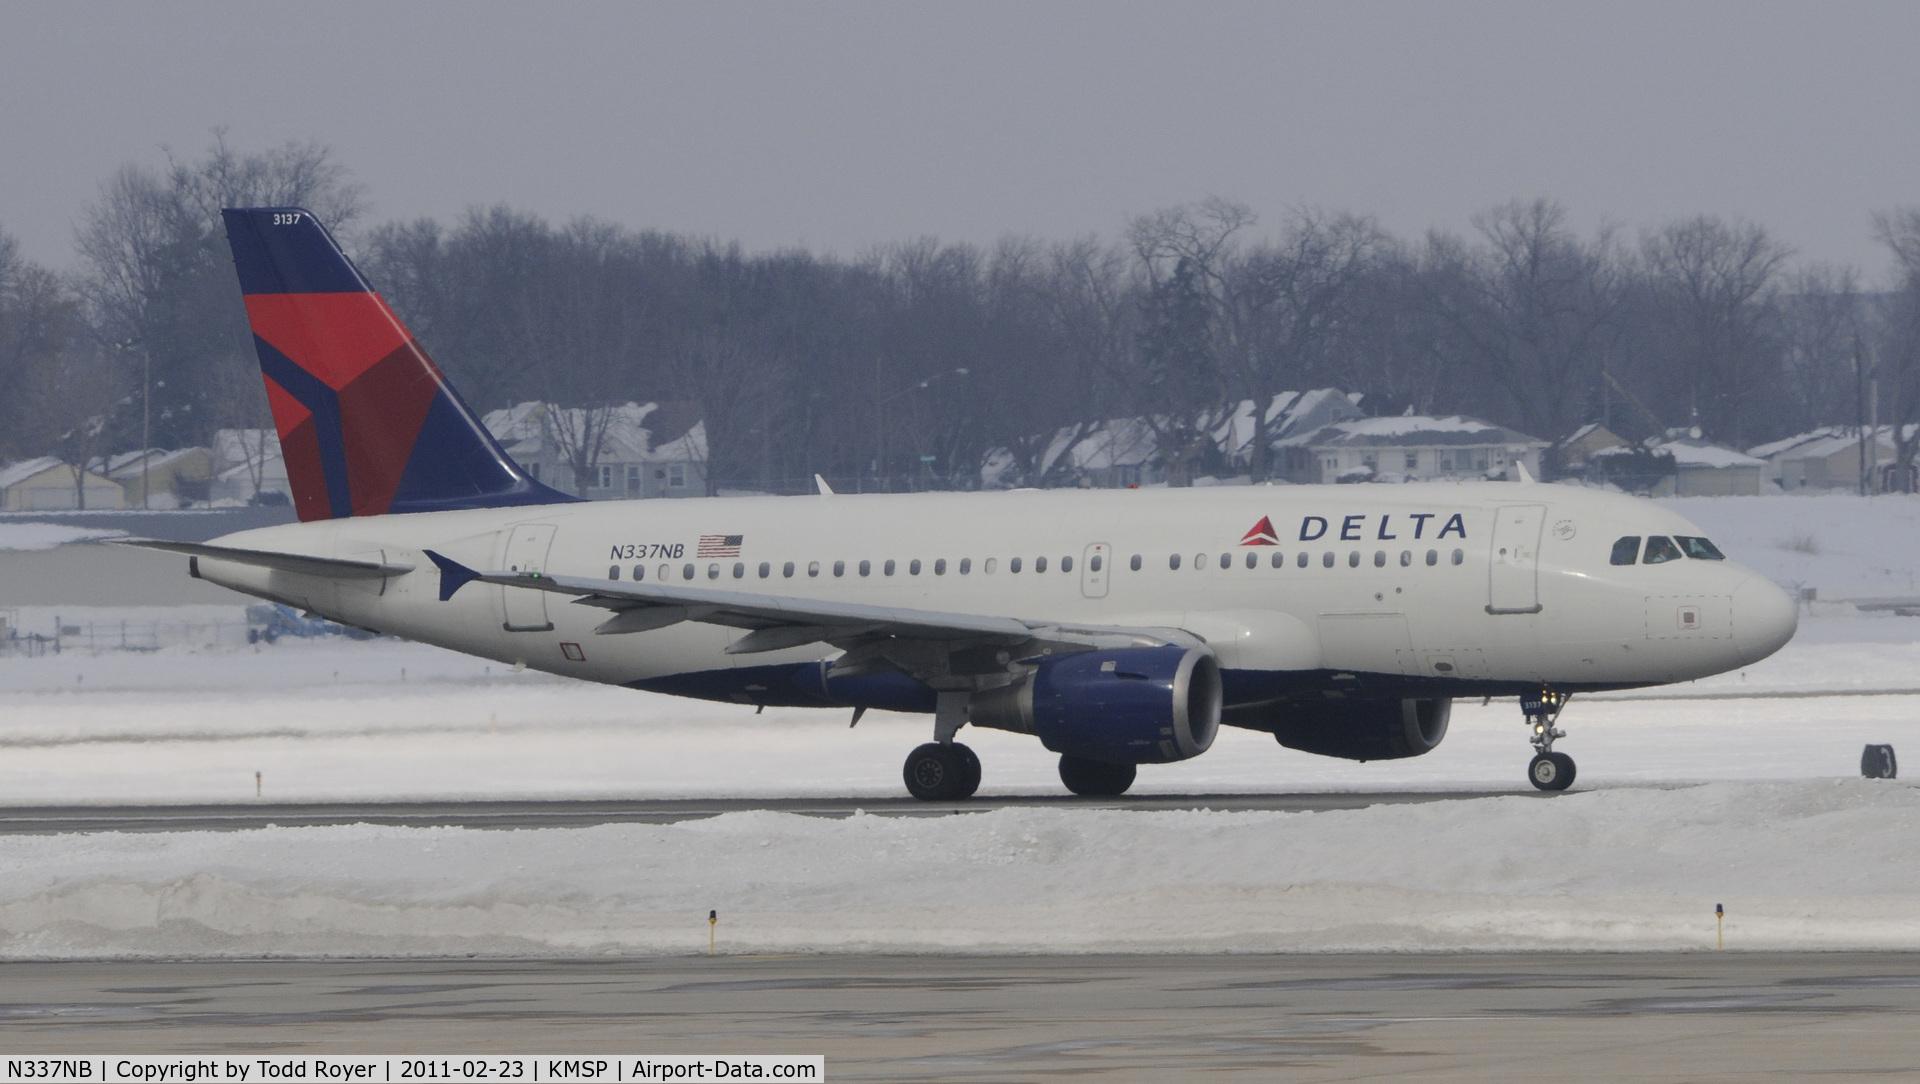 N337NB, 2002 Airbus A319-114 C/N 1685, Delta